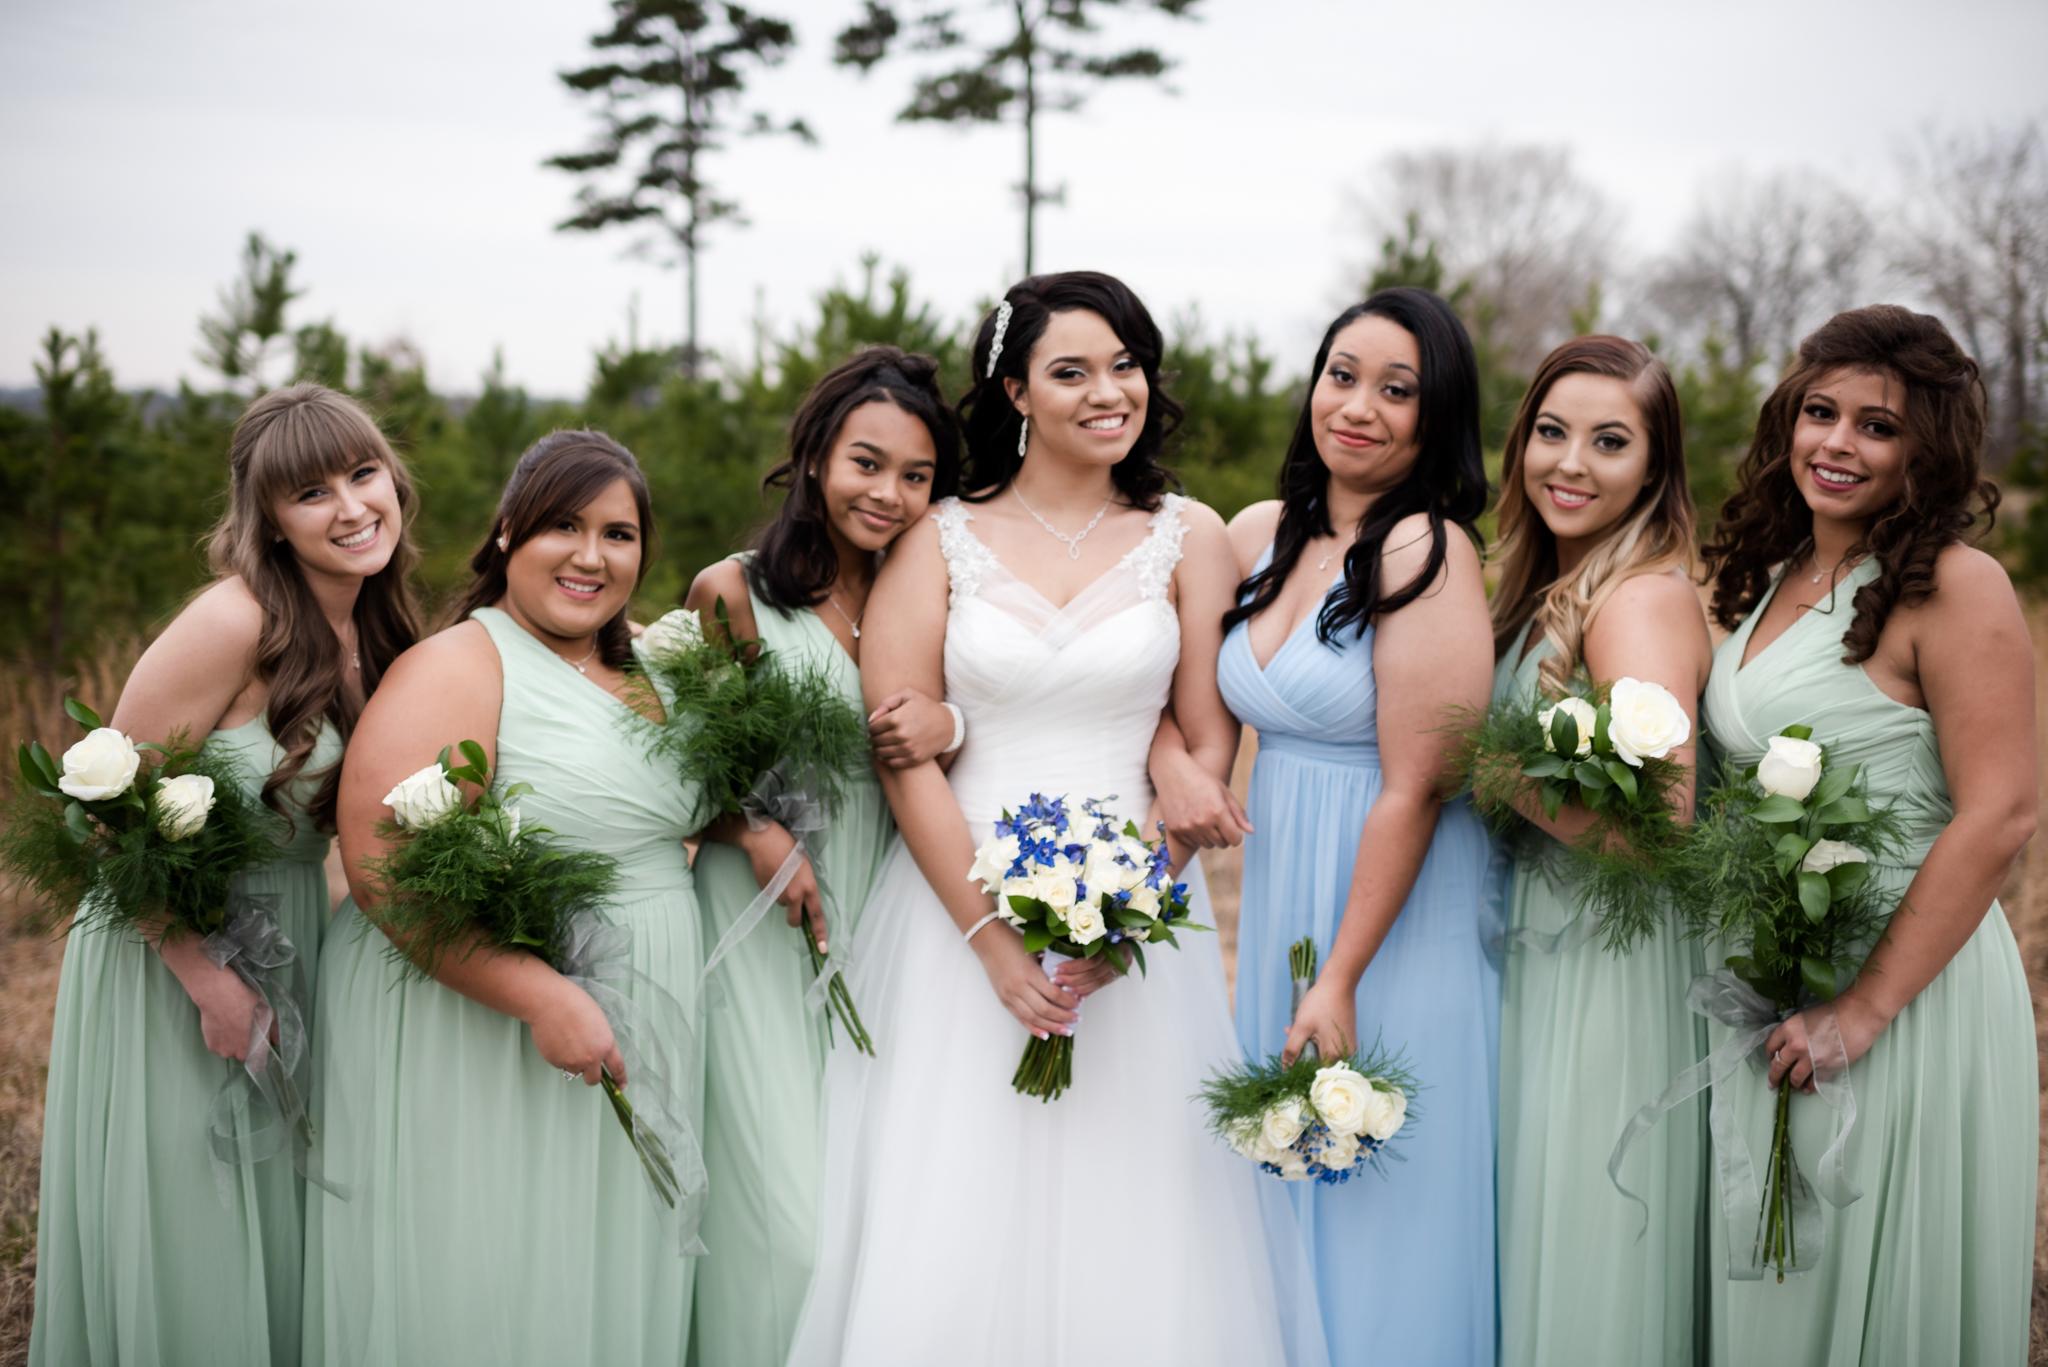 gibsonville-wedding-photography-014.jpg